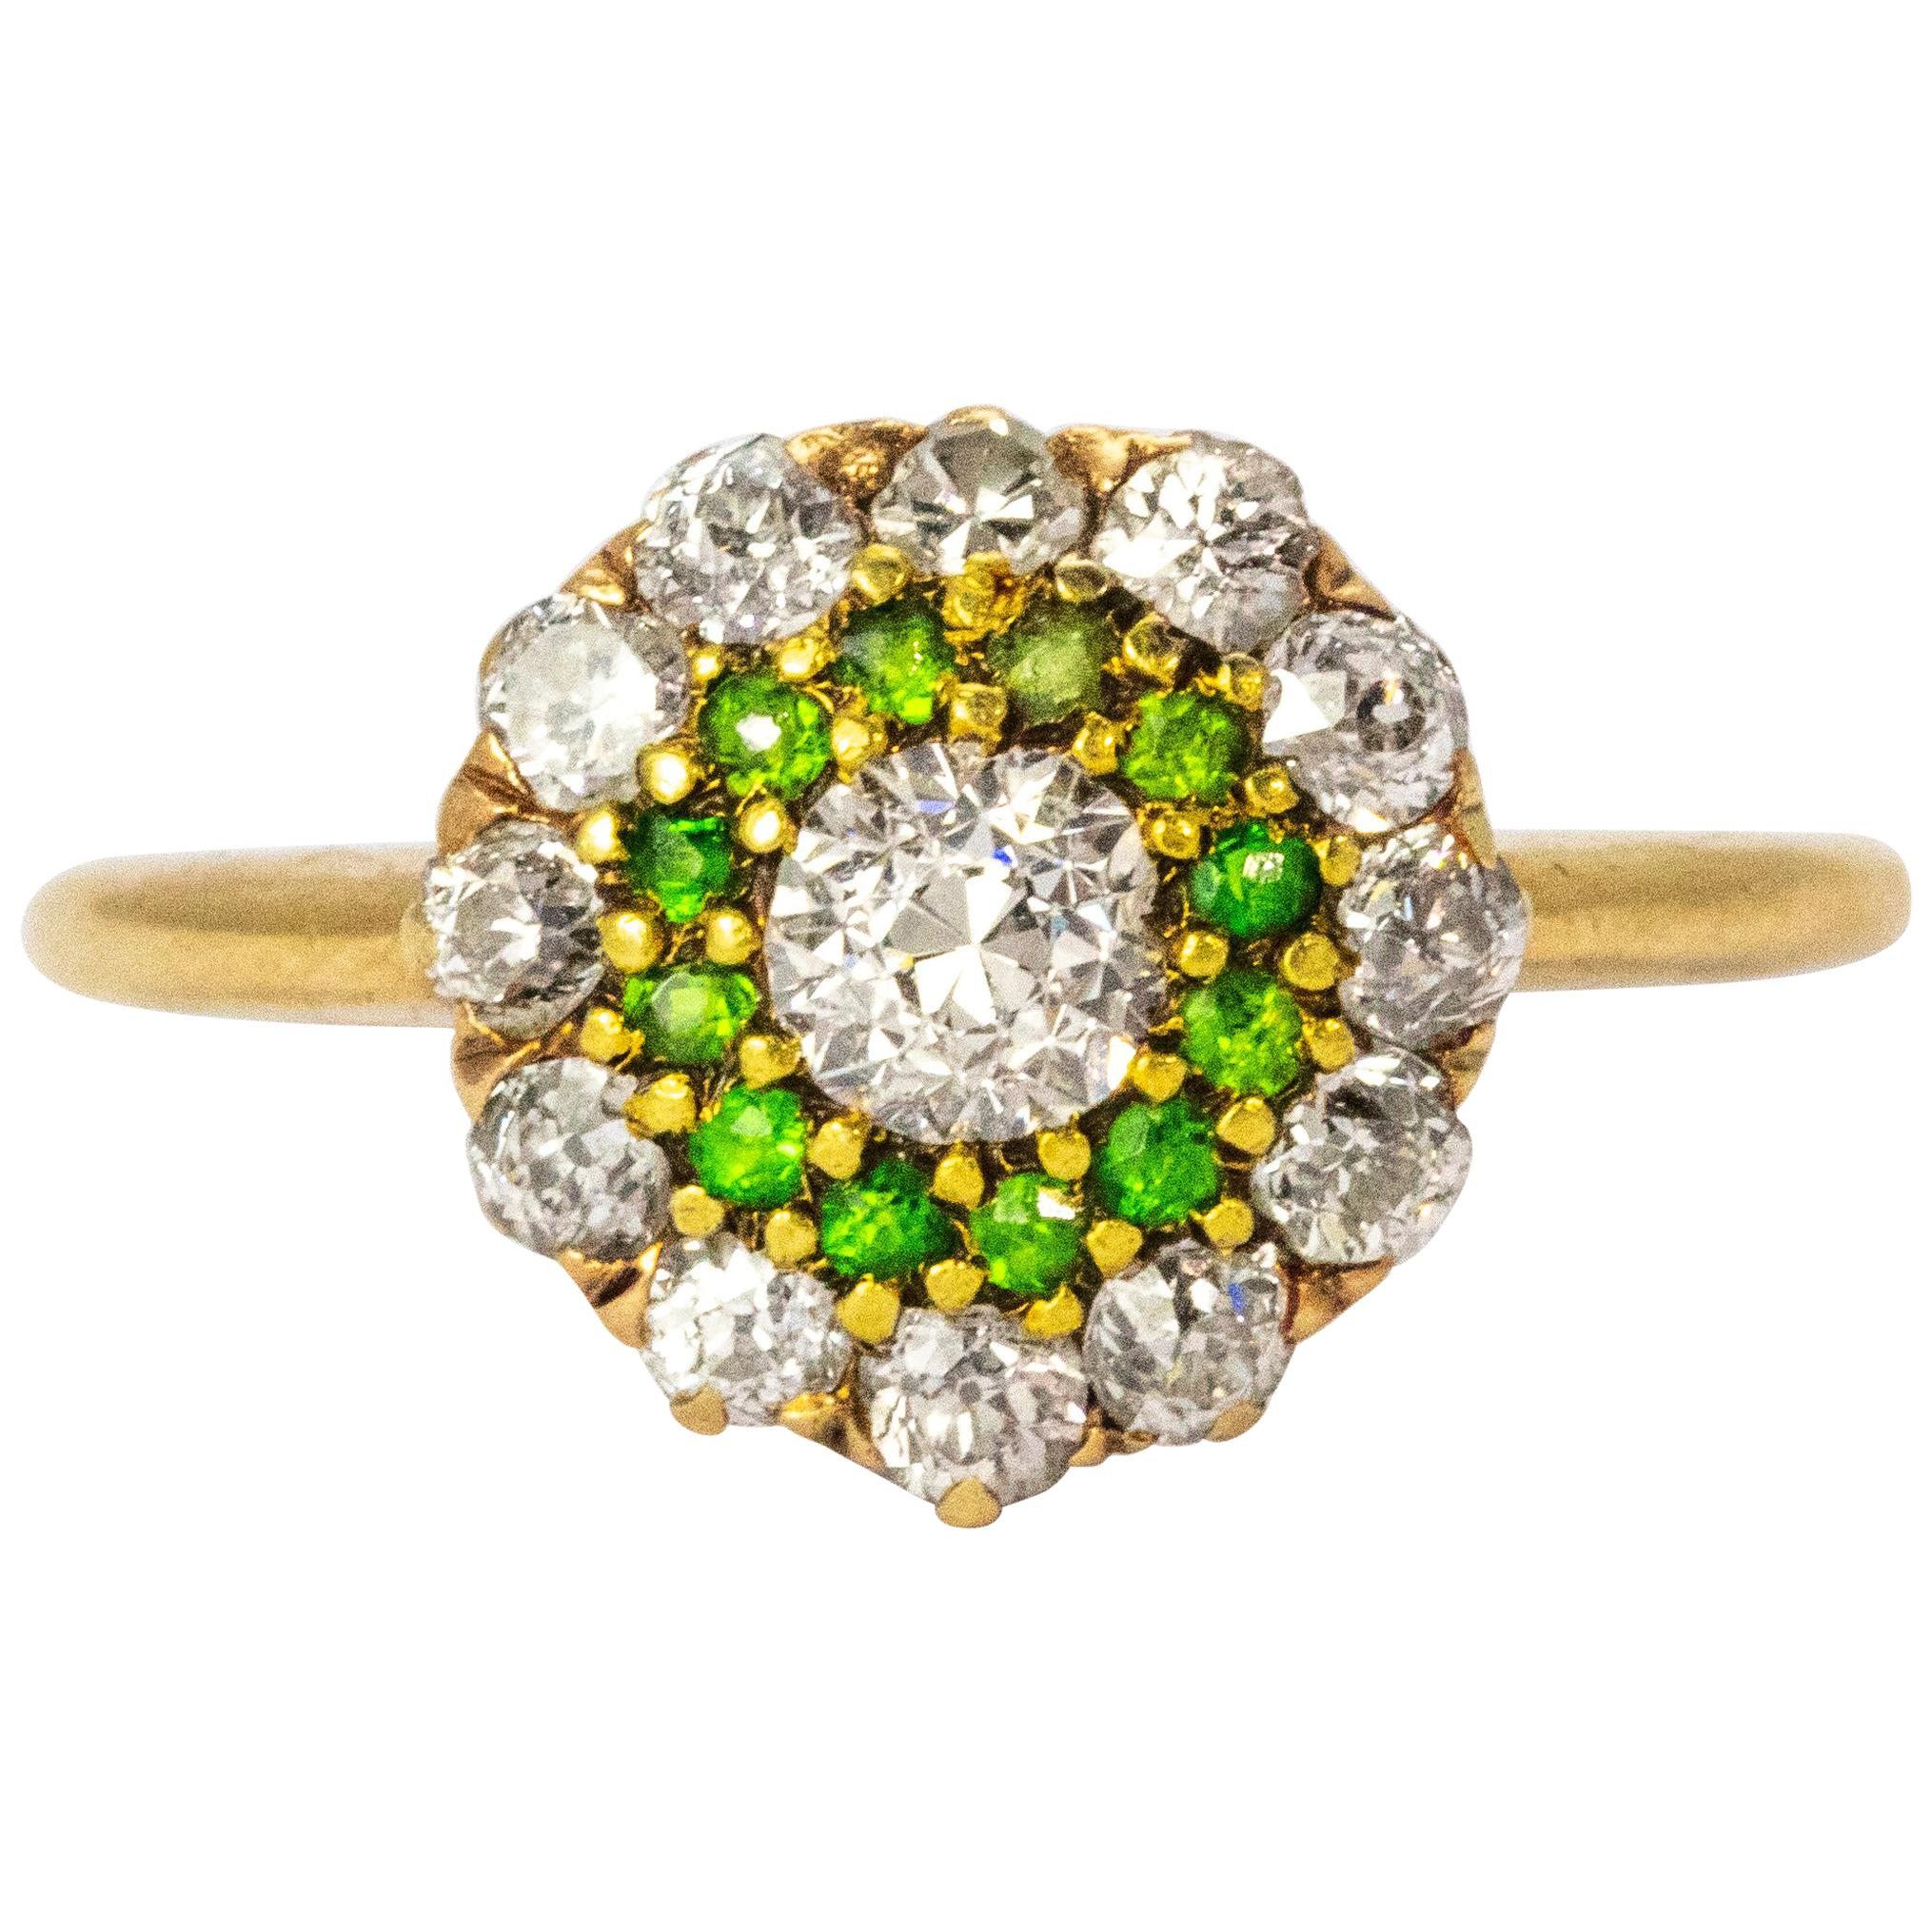 Vintage Diamond and Demantoid Garnet 18 Karat Gold Cluster Ring